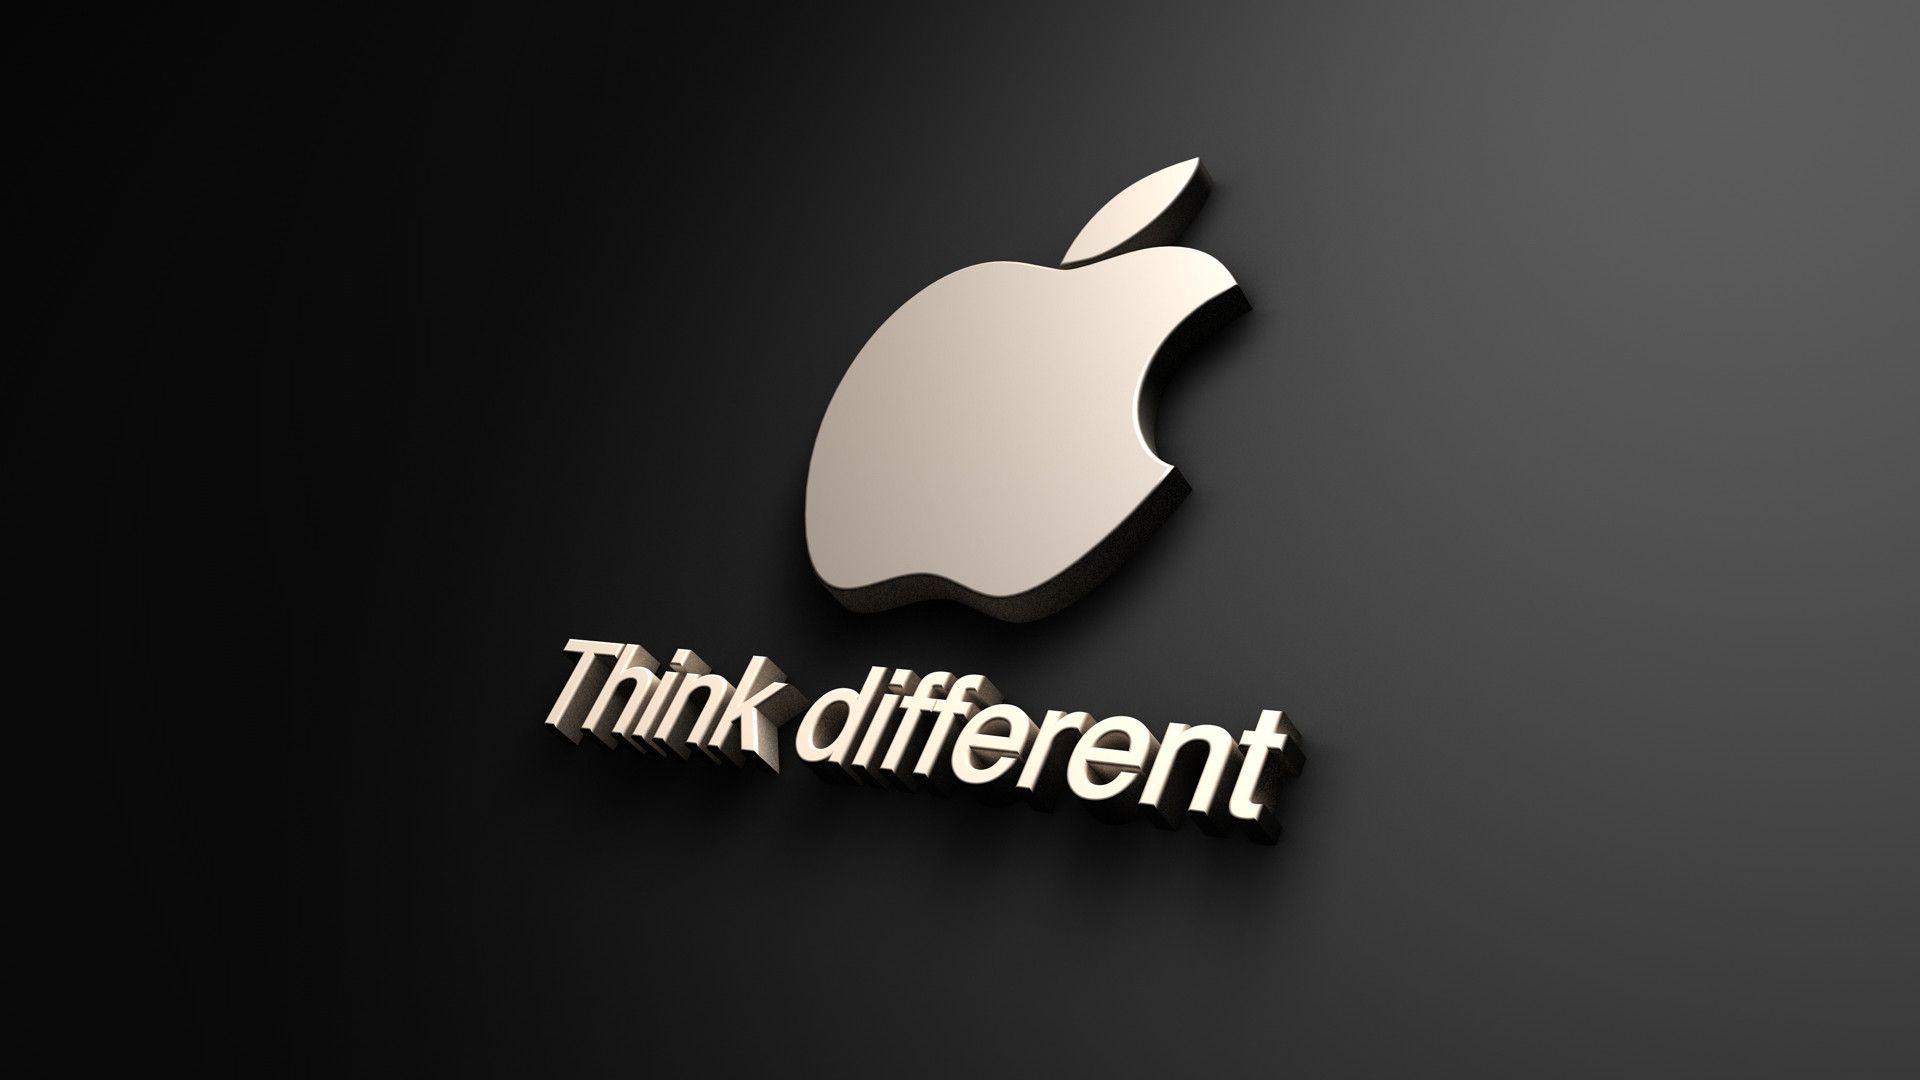 Wallpaper download apple - Apple Hd Wallpapers Group 1920 1080 Apple Hd Wallpaper 40 Wallpapers Adorable